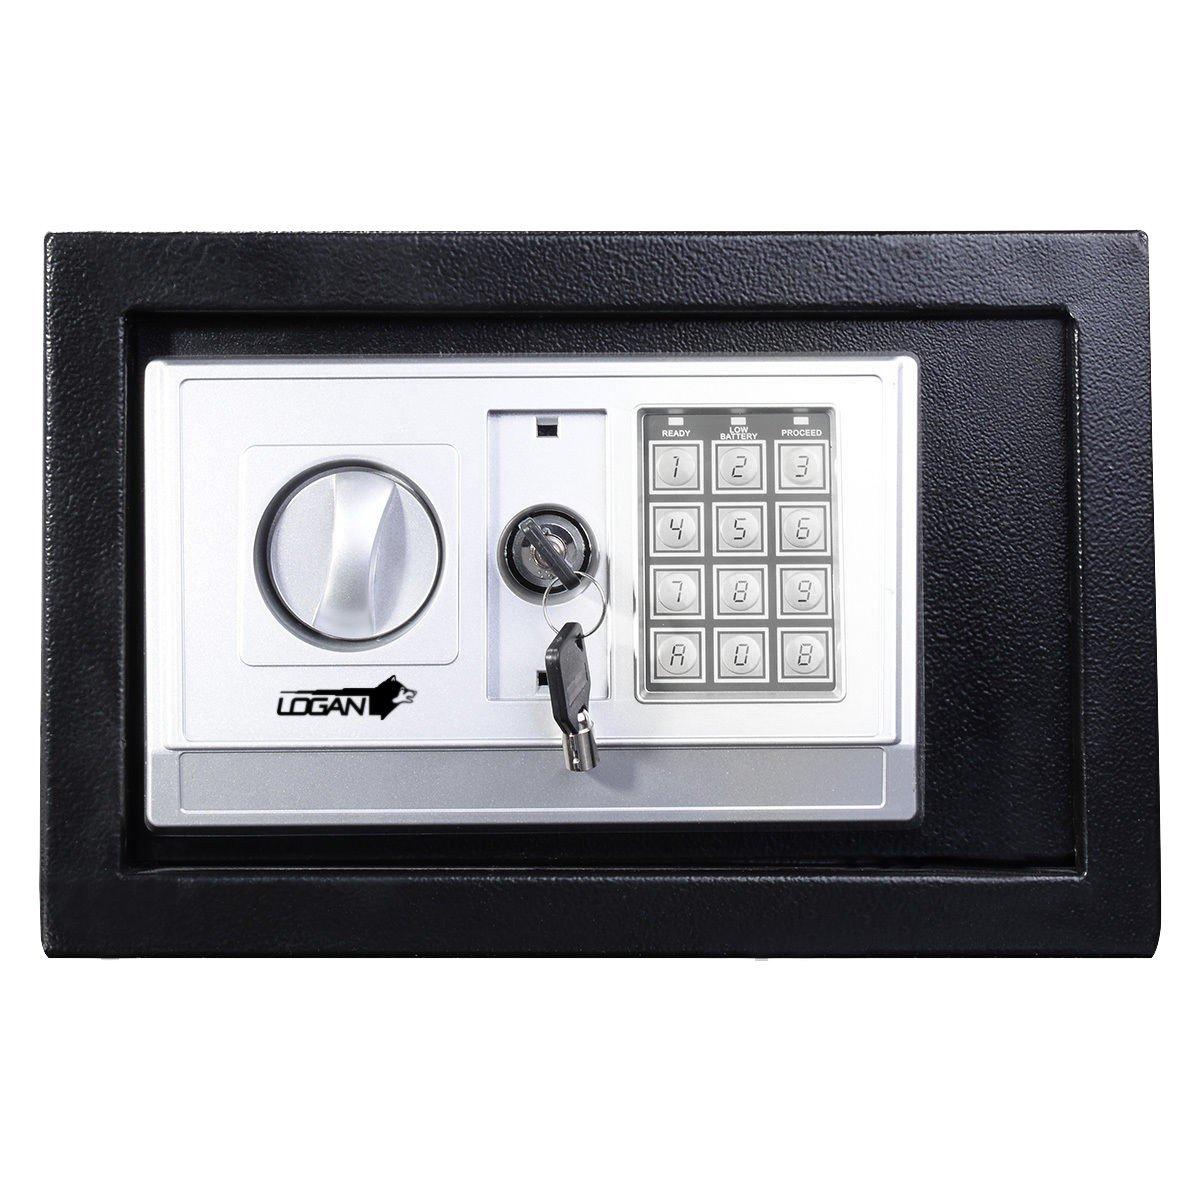 Amazon.com: Logan Digital Medium Size Safe Box (Medium, Black): Home Improvement